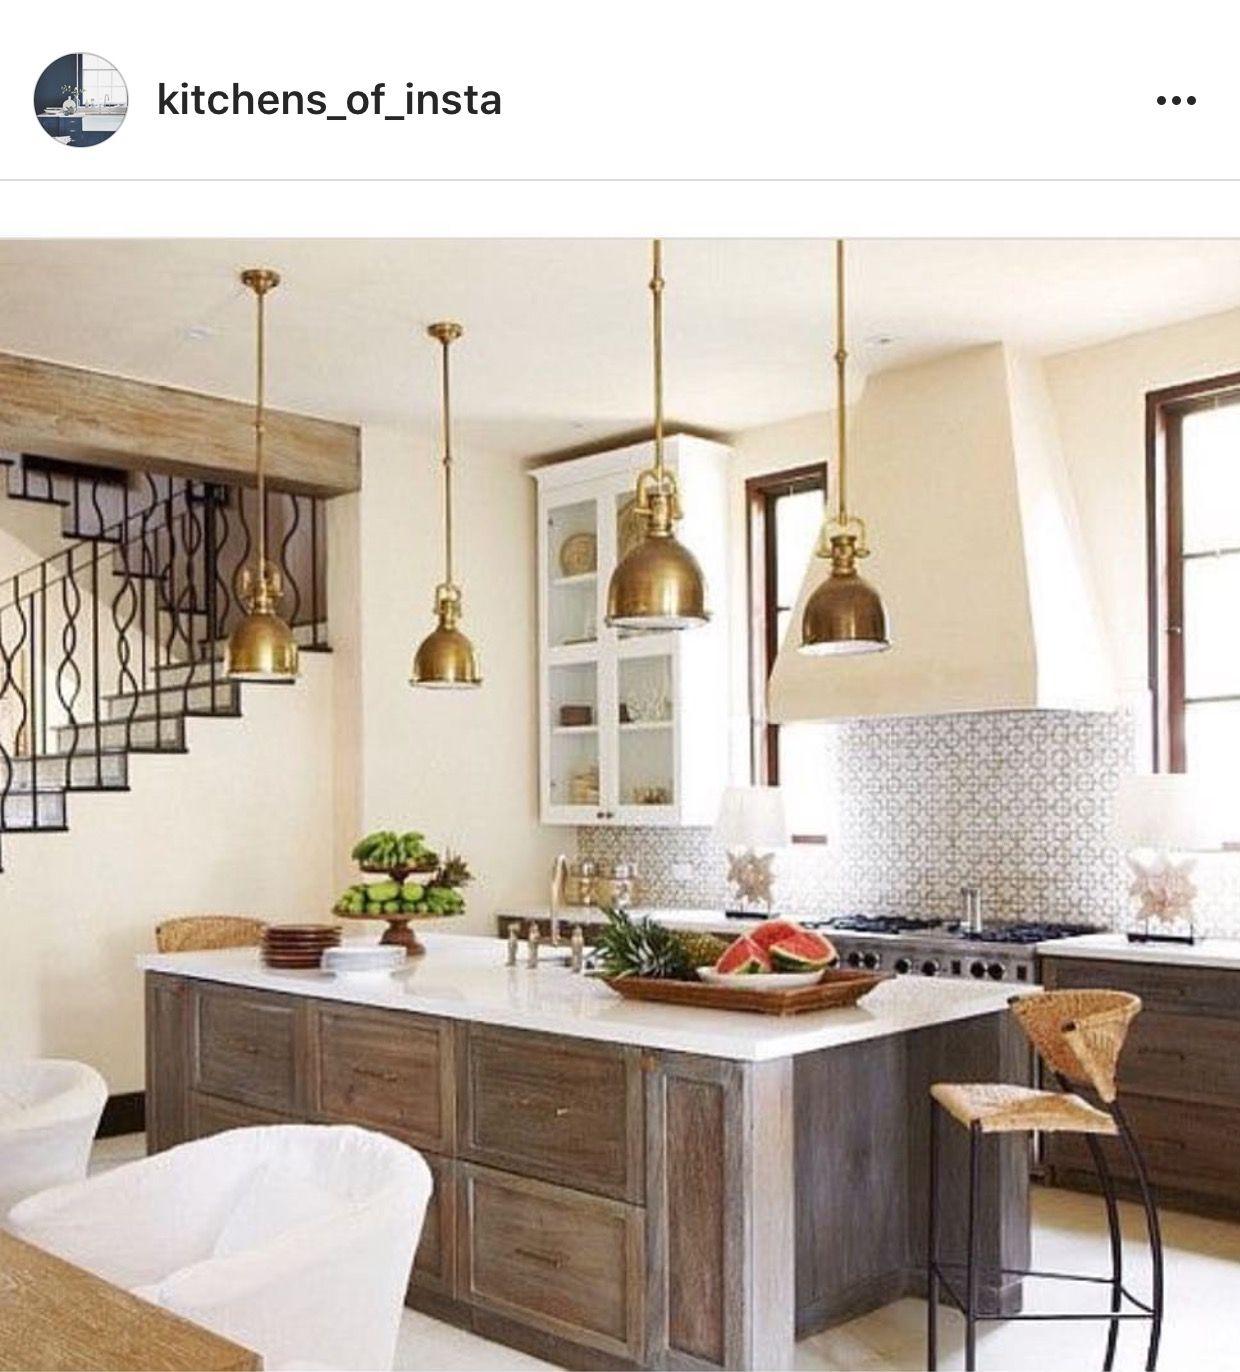 Pin By Michael Kaser On Interior: Kitchen